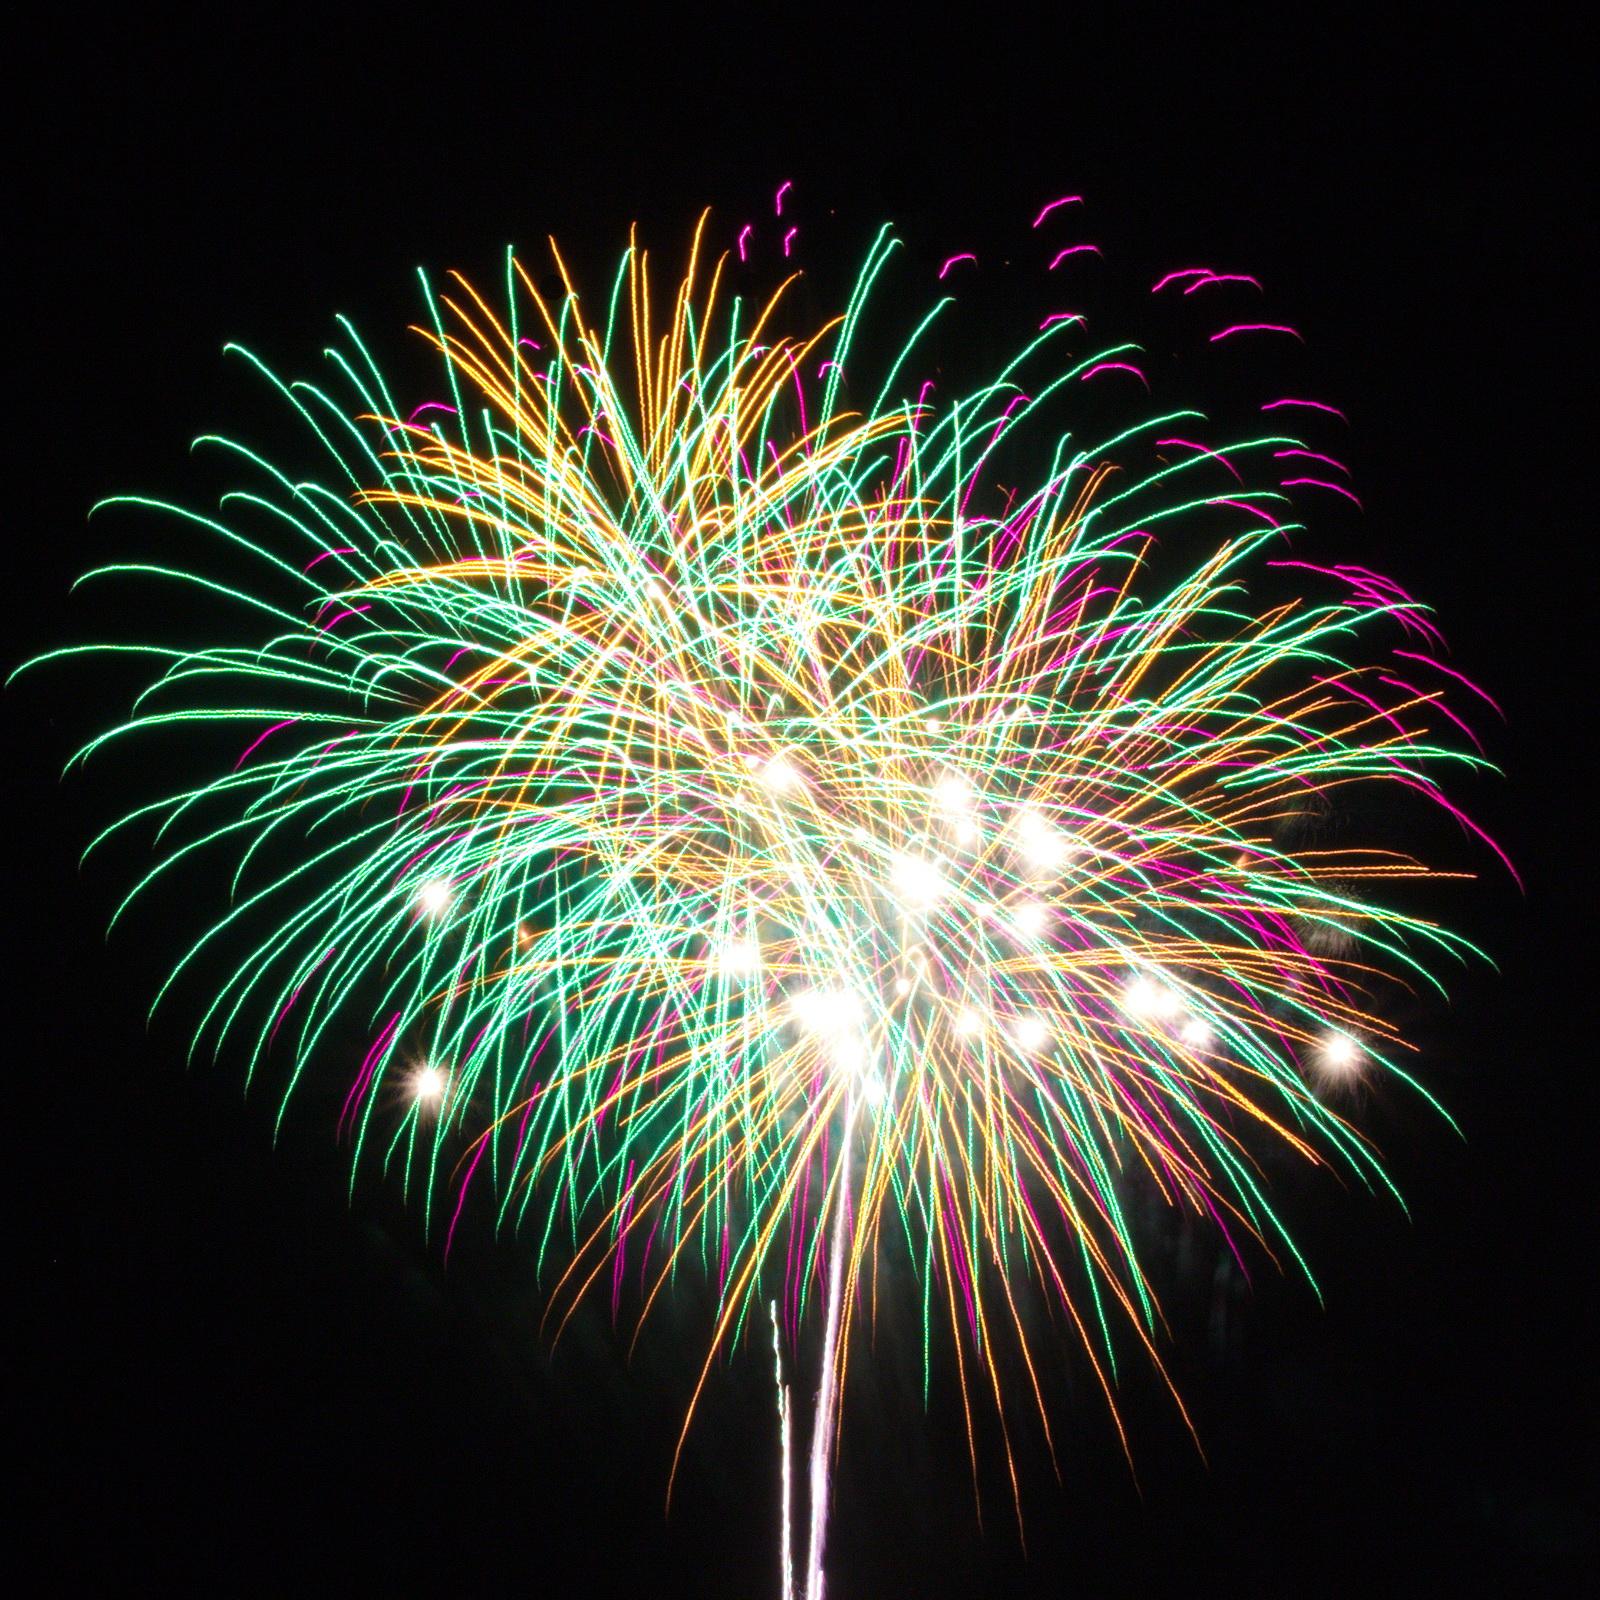 Massachusetts Fireworks go2.guide green, yellow, white and purple pyrotechnics